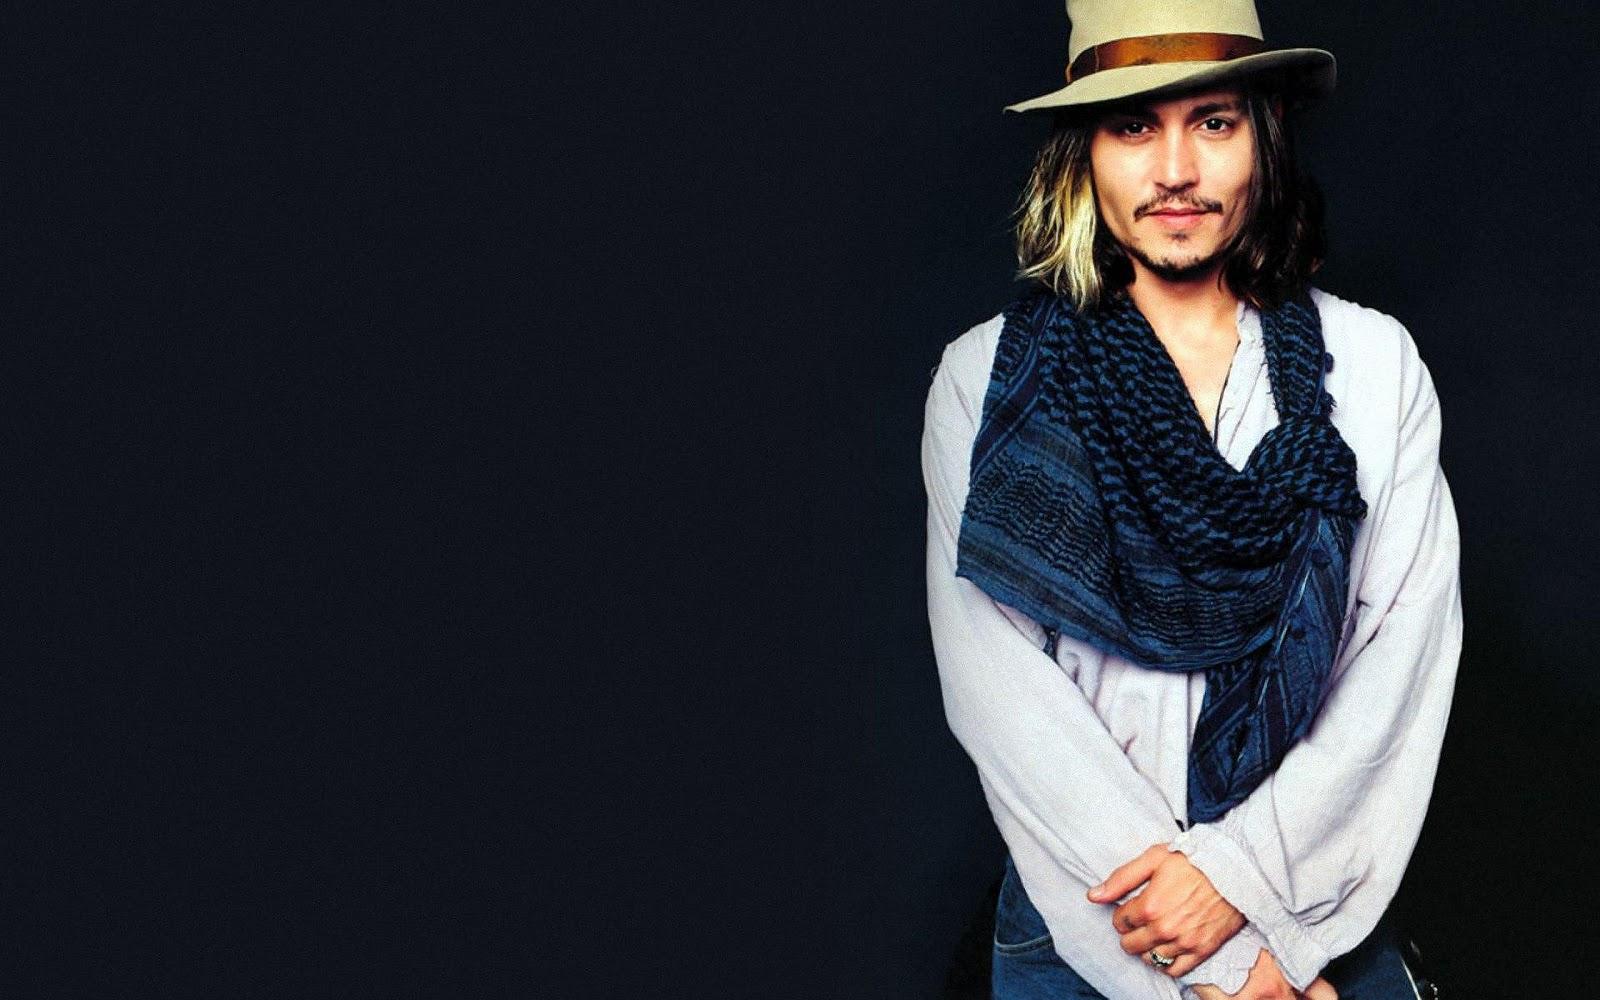 Johnny Depp Wallpapers   Best HD Desktop Wallpaper 1600x1000